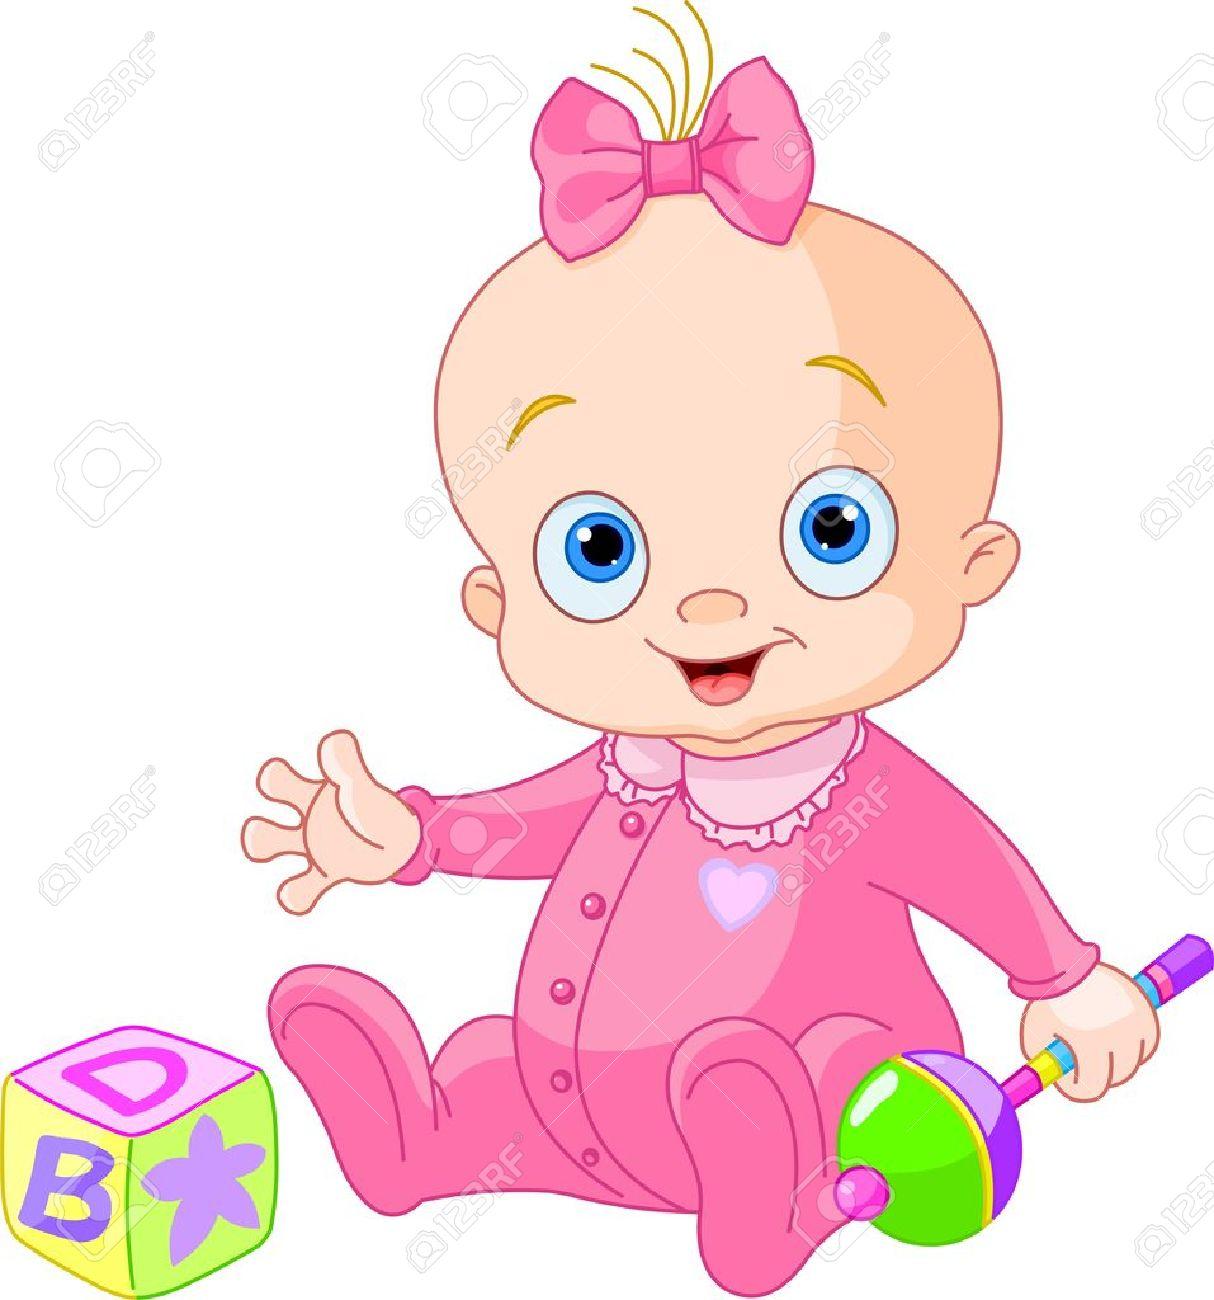 Baby playing jpg